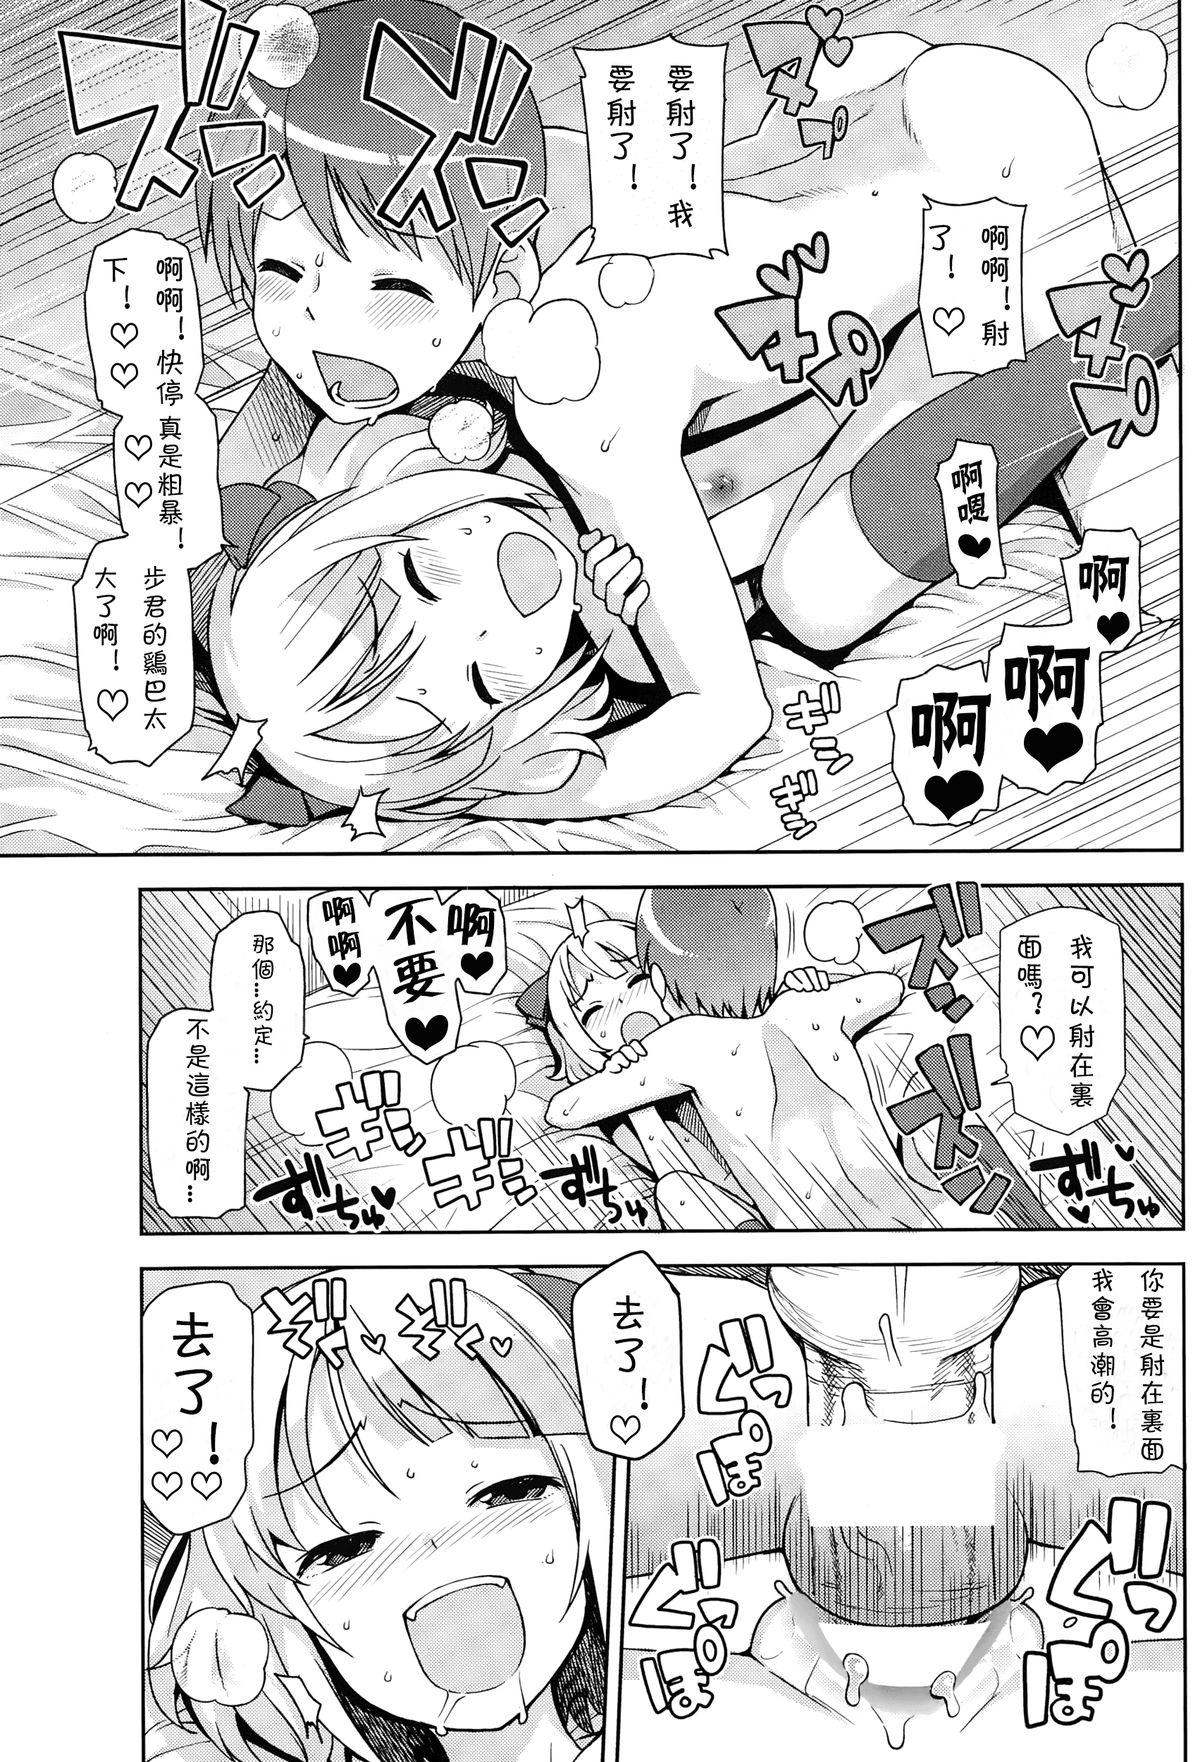 Watashi ga Suki na Aitsu no xxx | Having XXX with the one I love Ch. 1-2 10